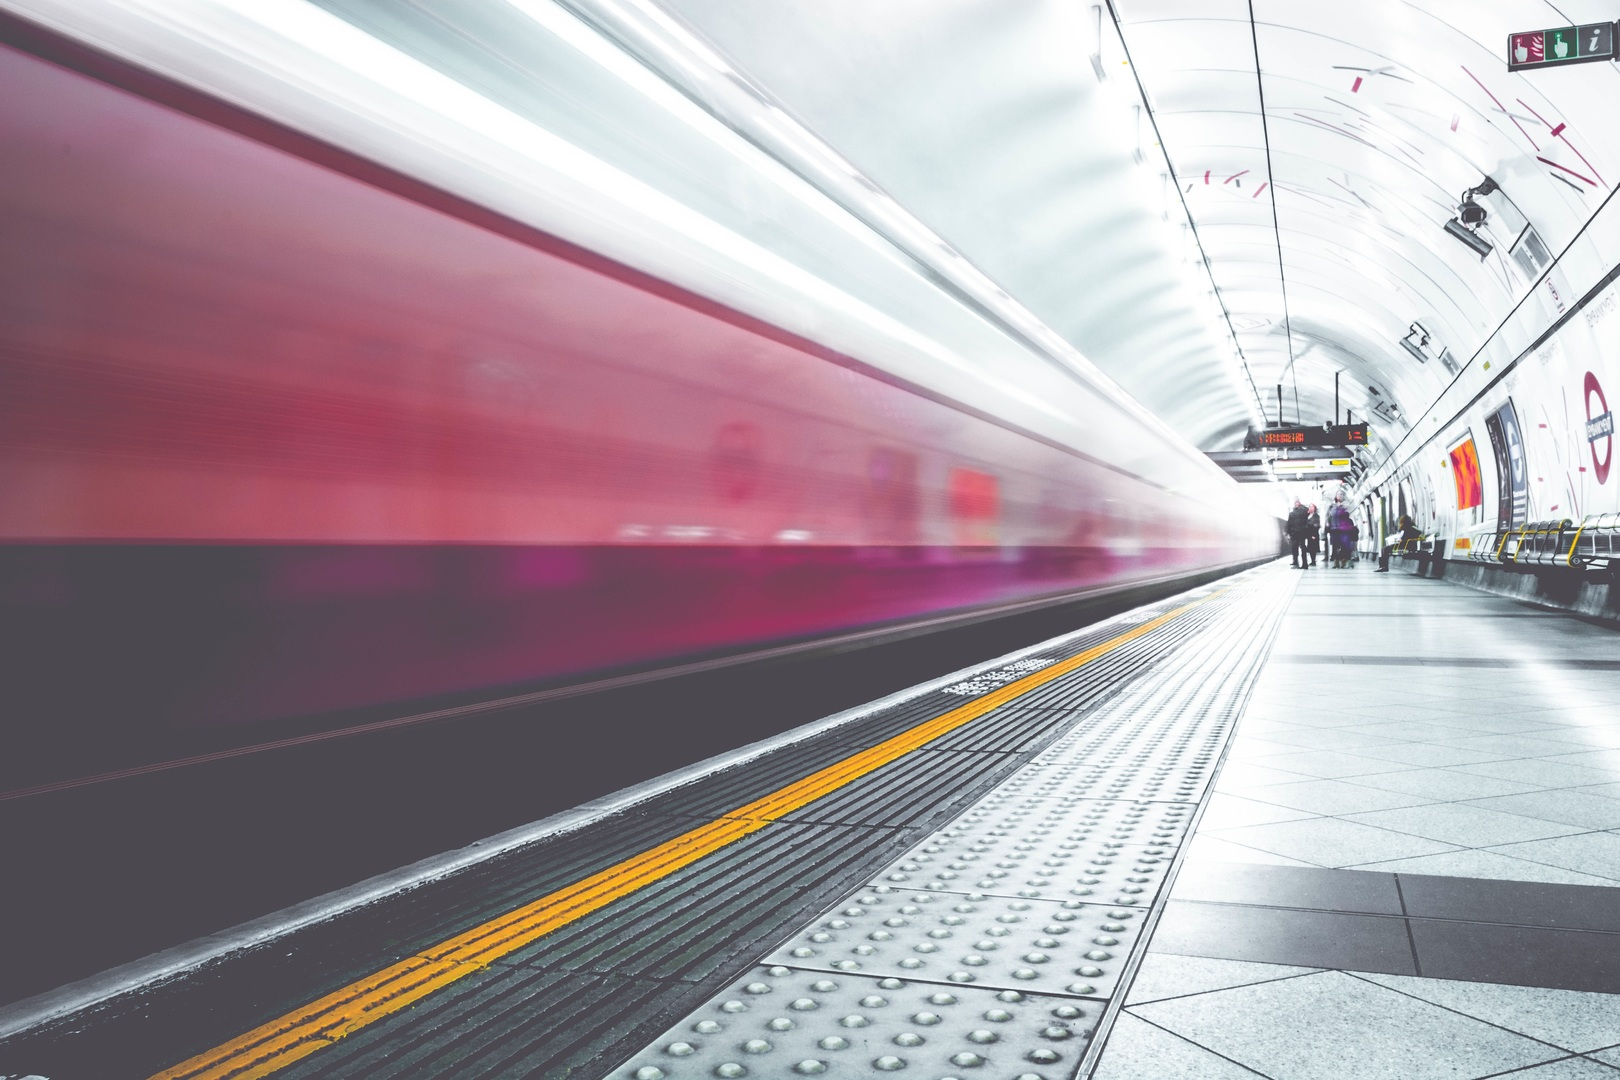 trein tram stad verkeer transport logistiek mobiliteit